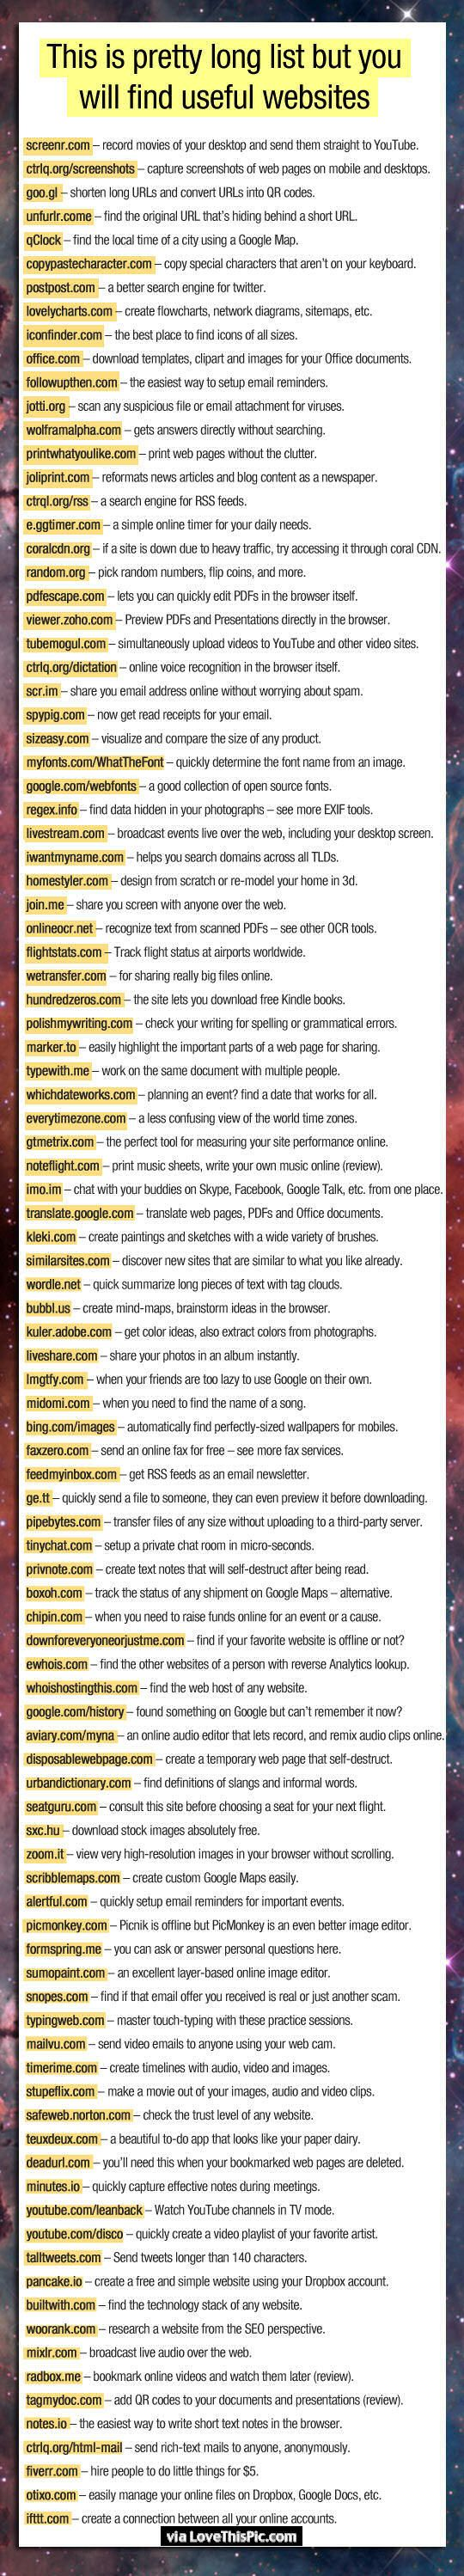 Here Is A Long List Of Useful Websites diy internet diy ideas easy diy interesting tips life hacks life hack websites good to know